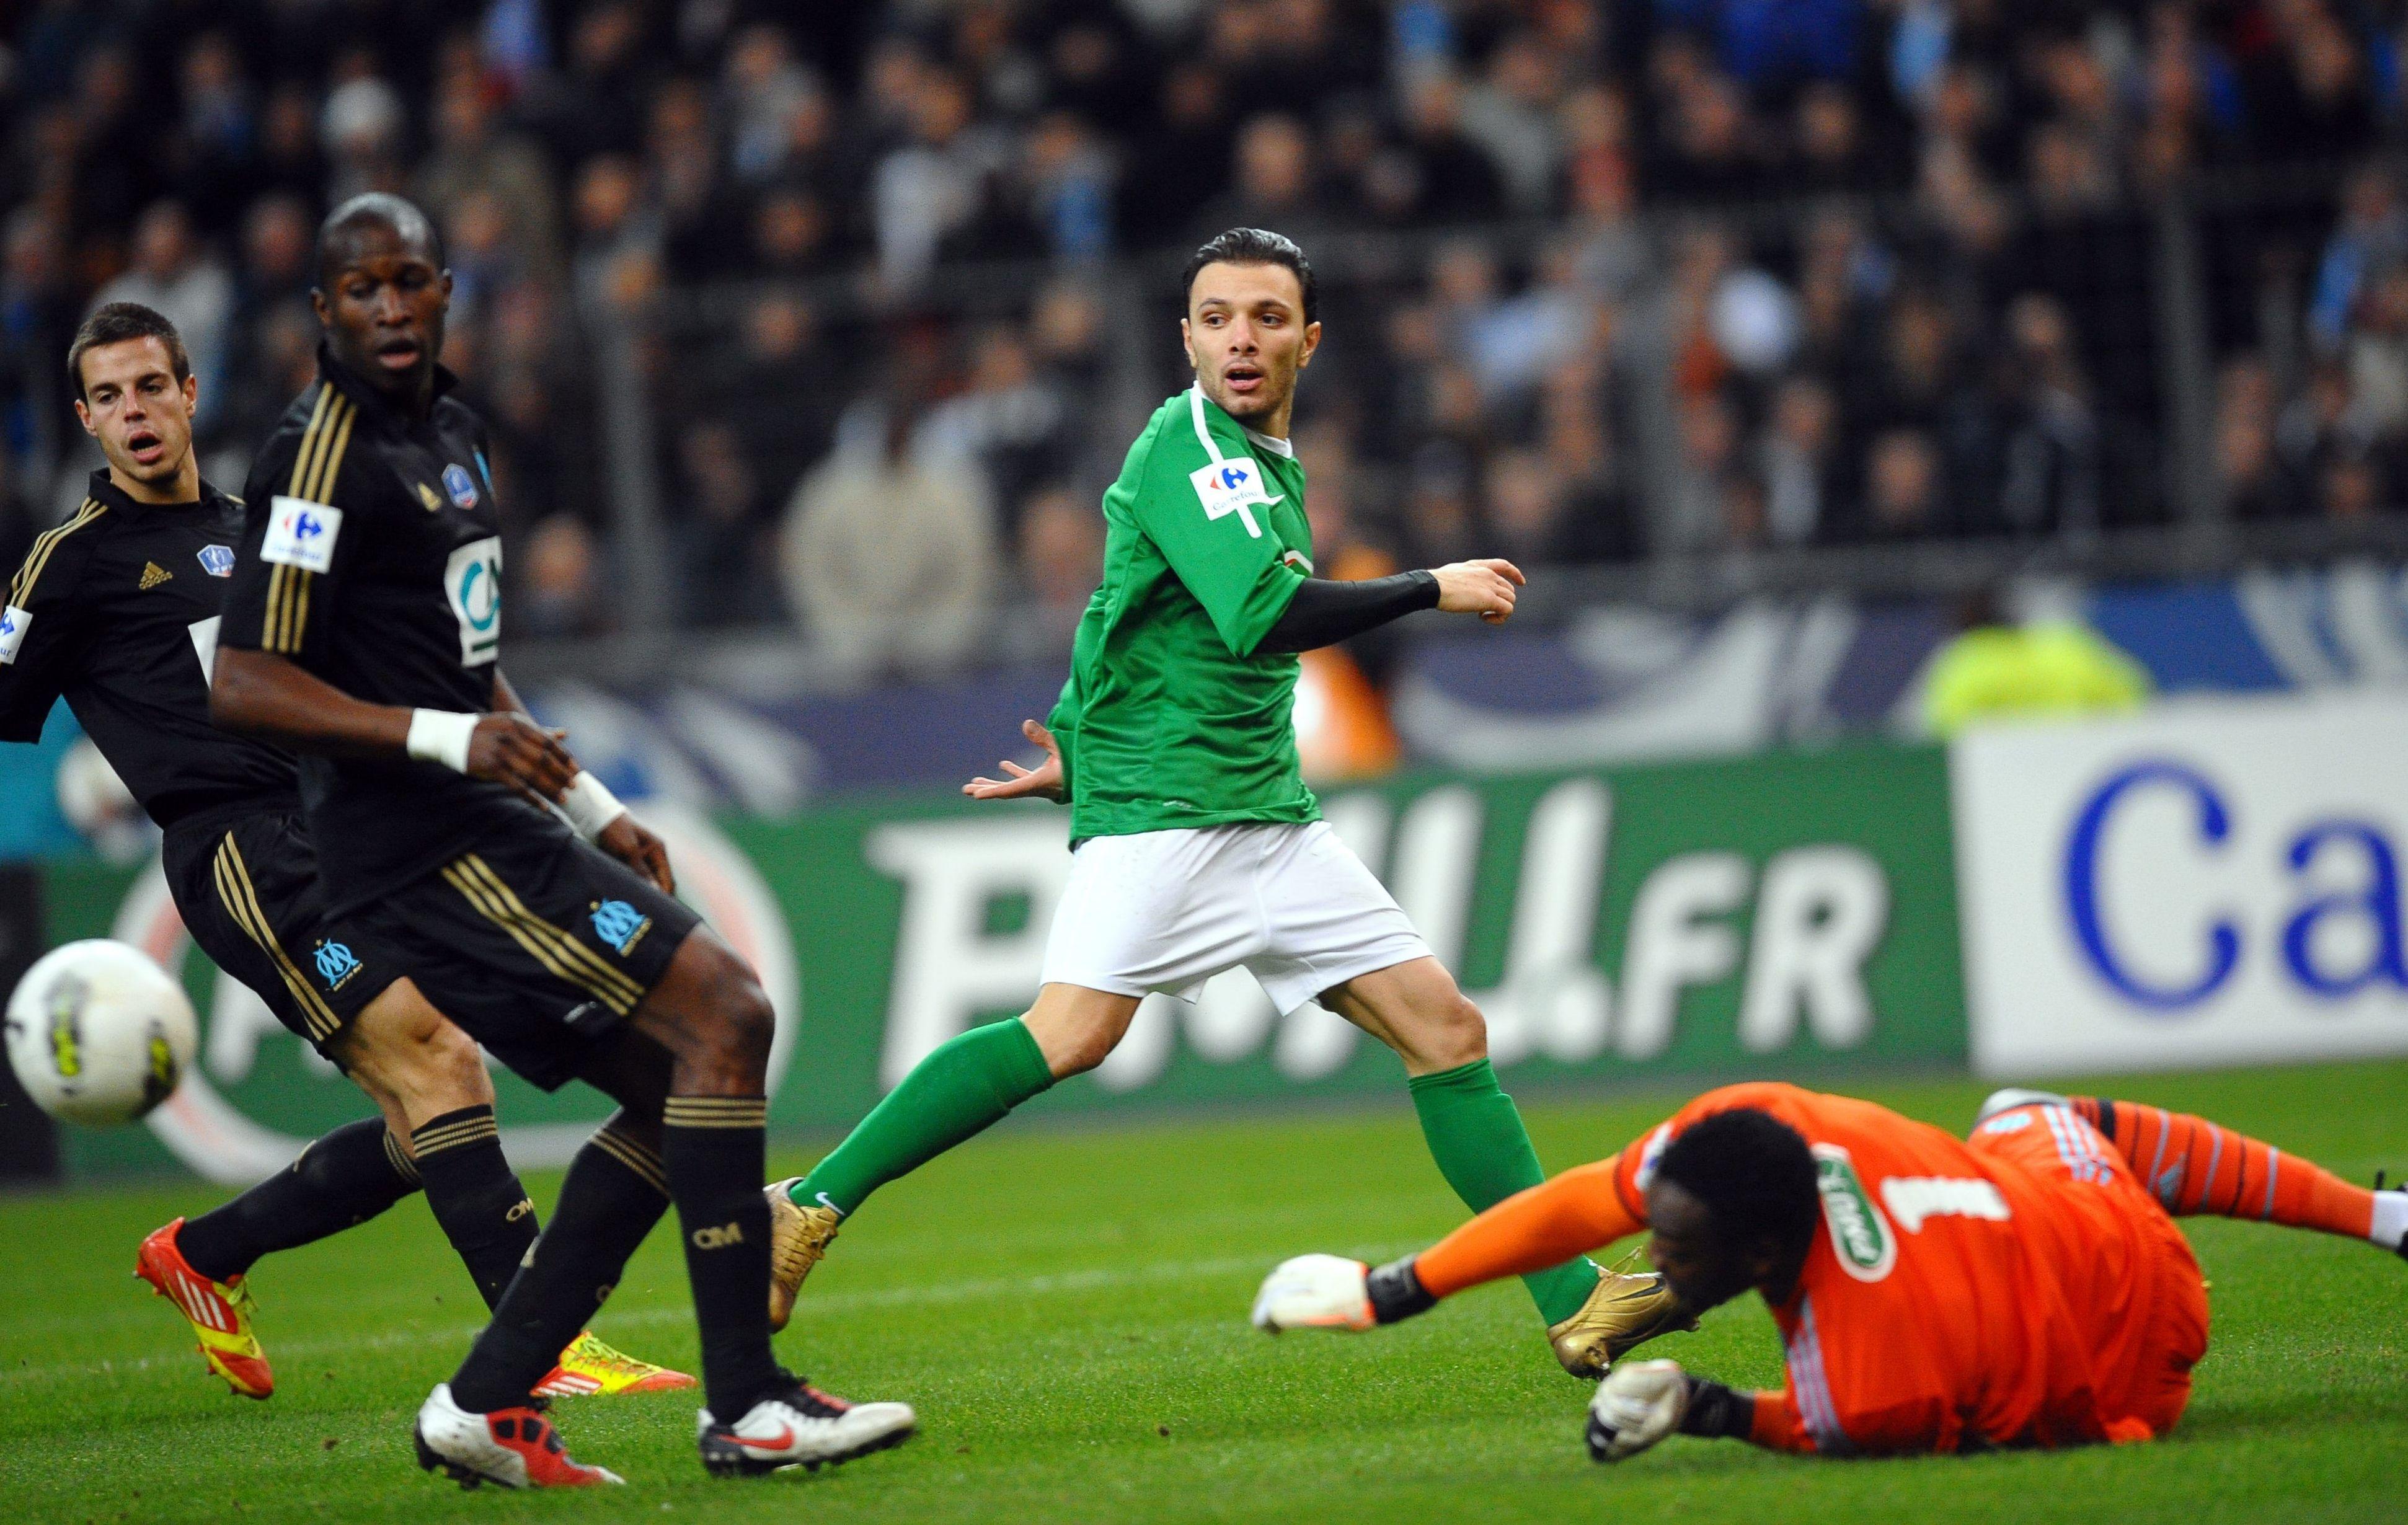 Ramener la coupe marseille coupe de france football - Marseille coupe de france ...